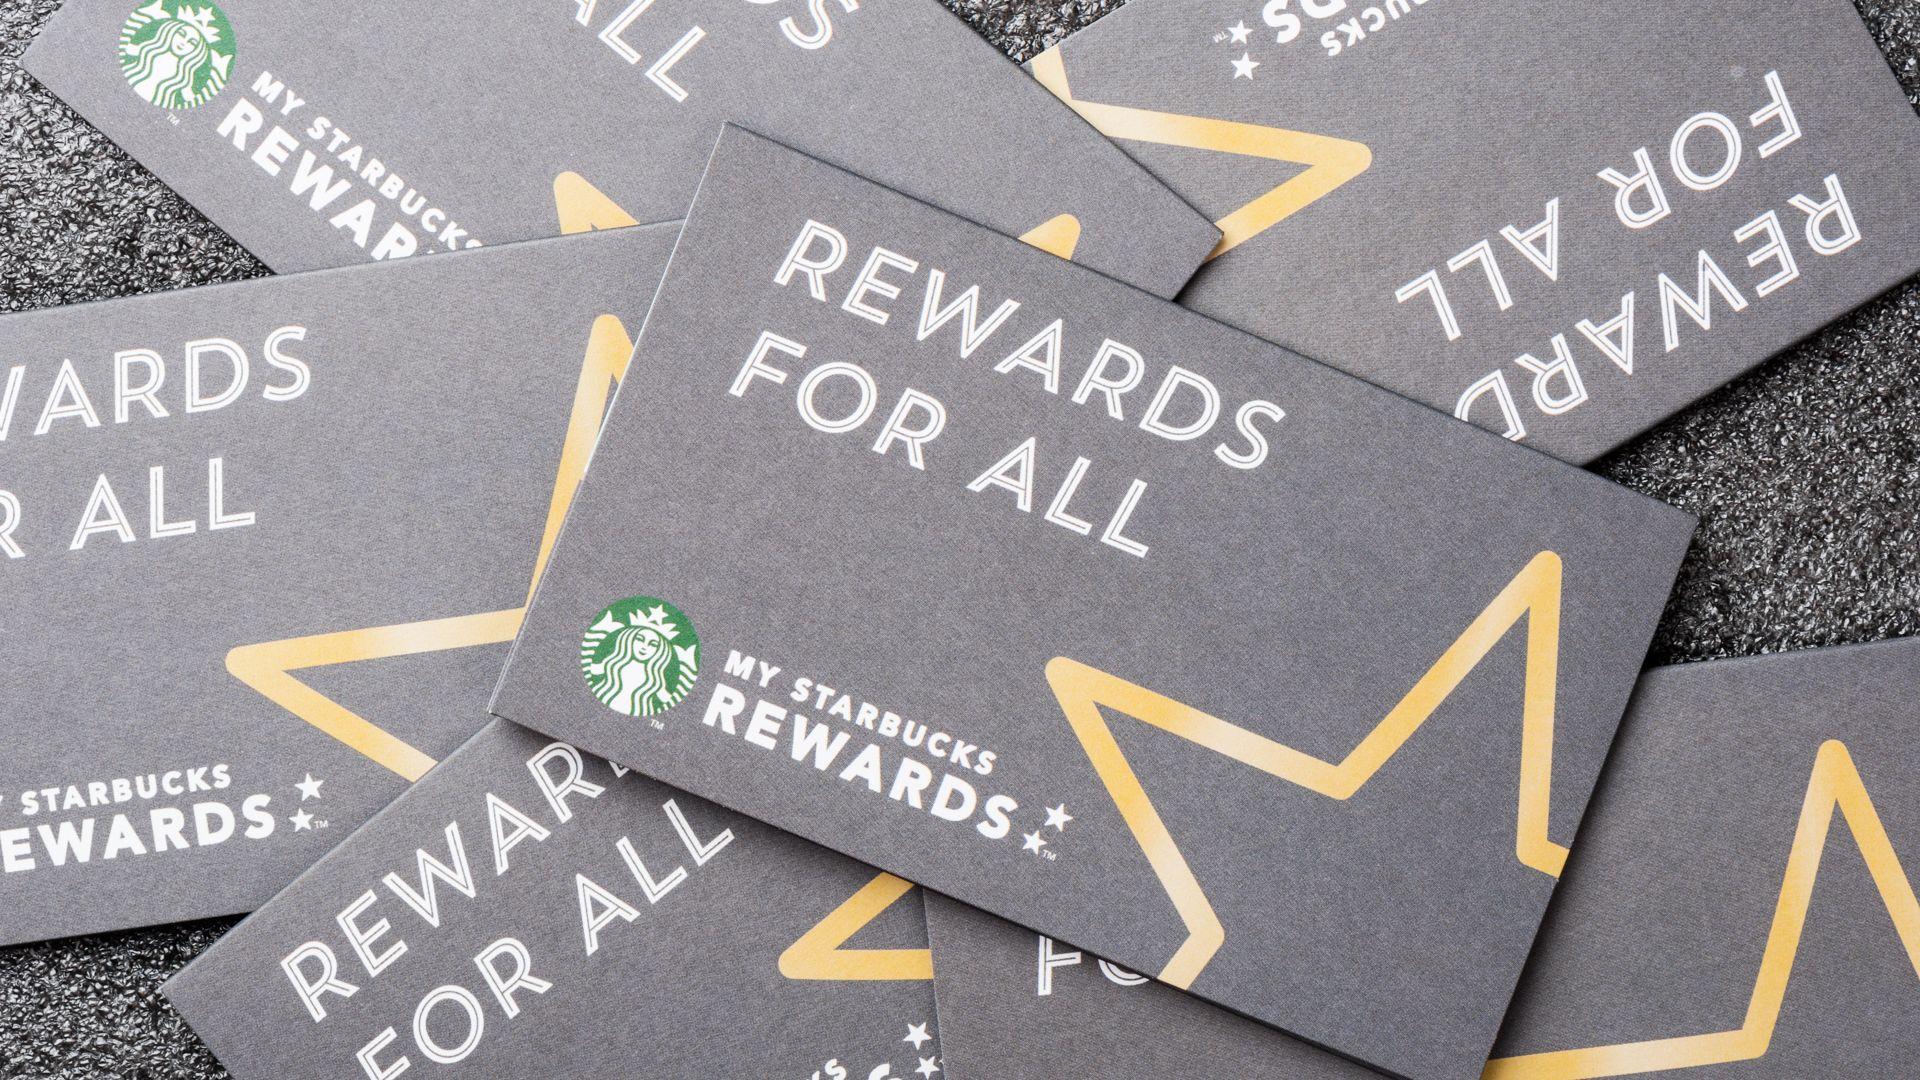 Starbucks relaunches it's Star Rewards Program